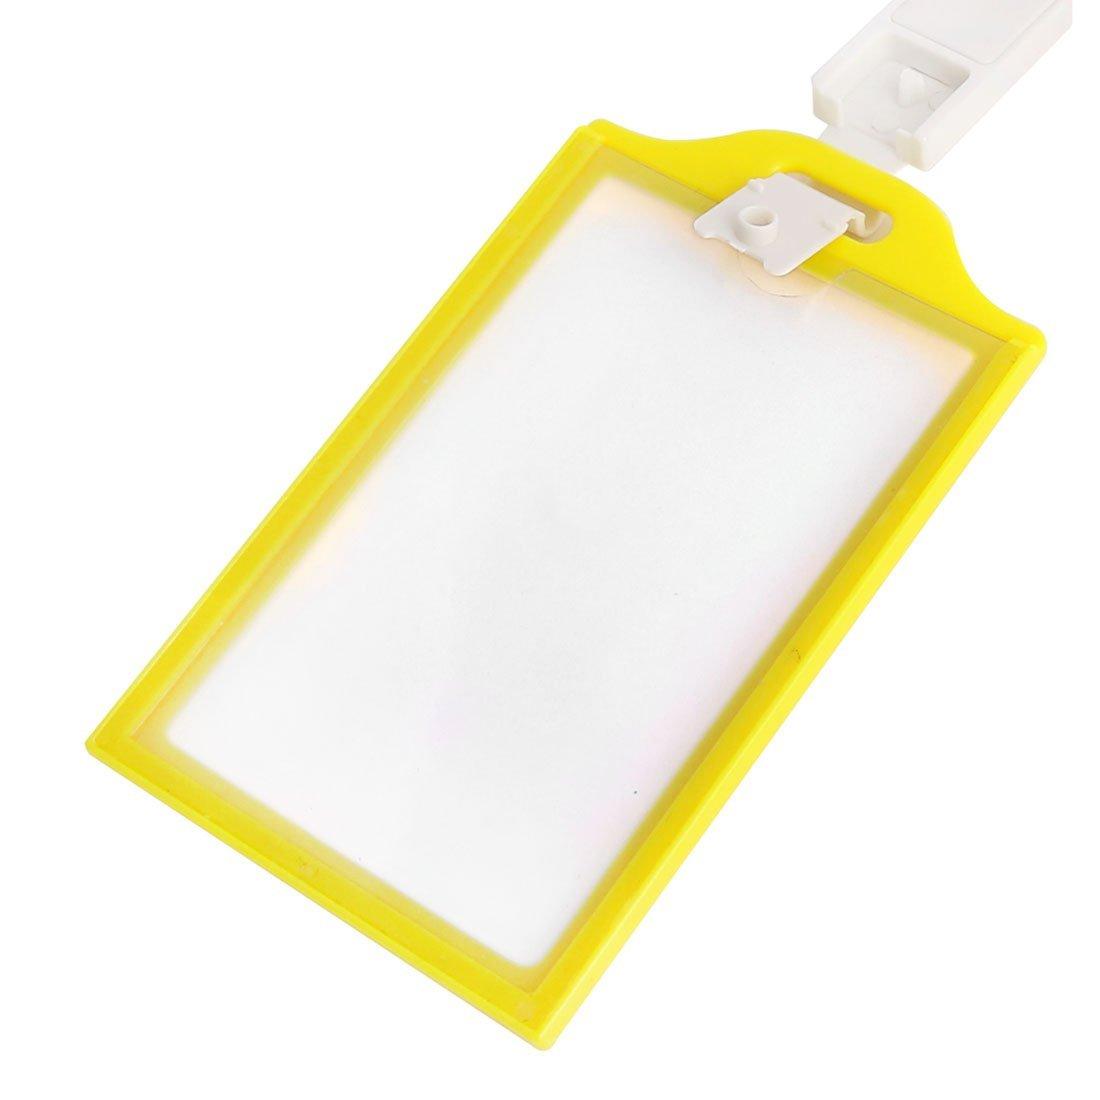 DealMux Plastic Rim Vertical Office School Badge ID Card Holder 10 Pcs Yellow Clear